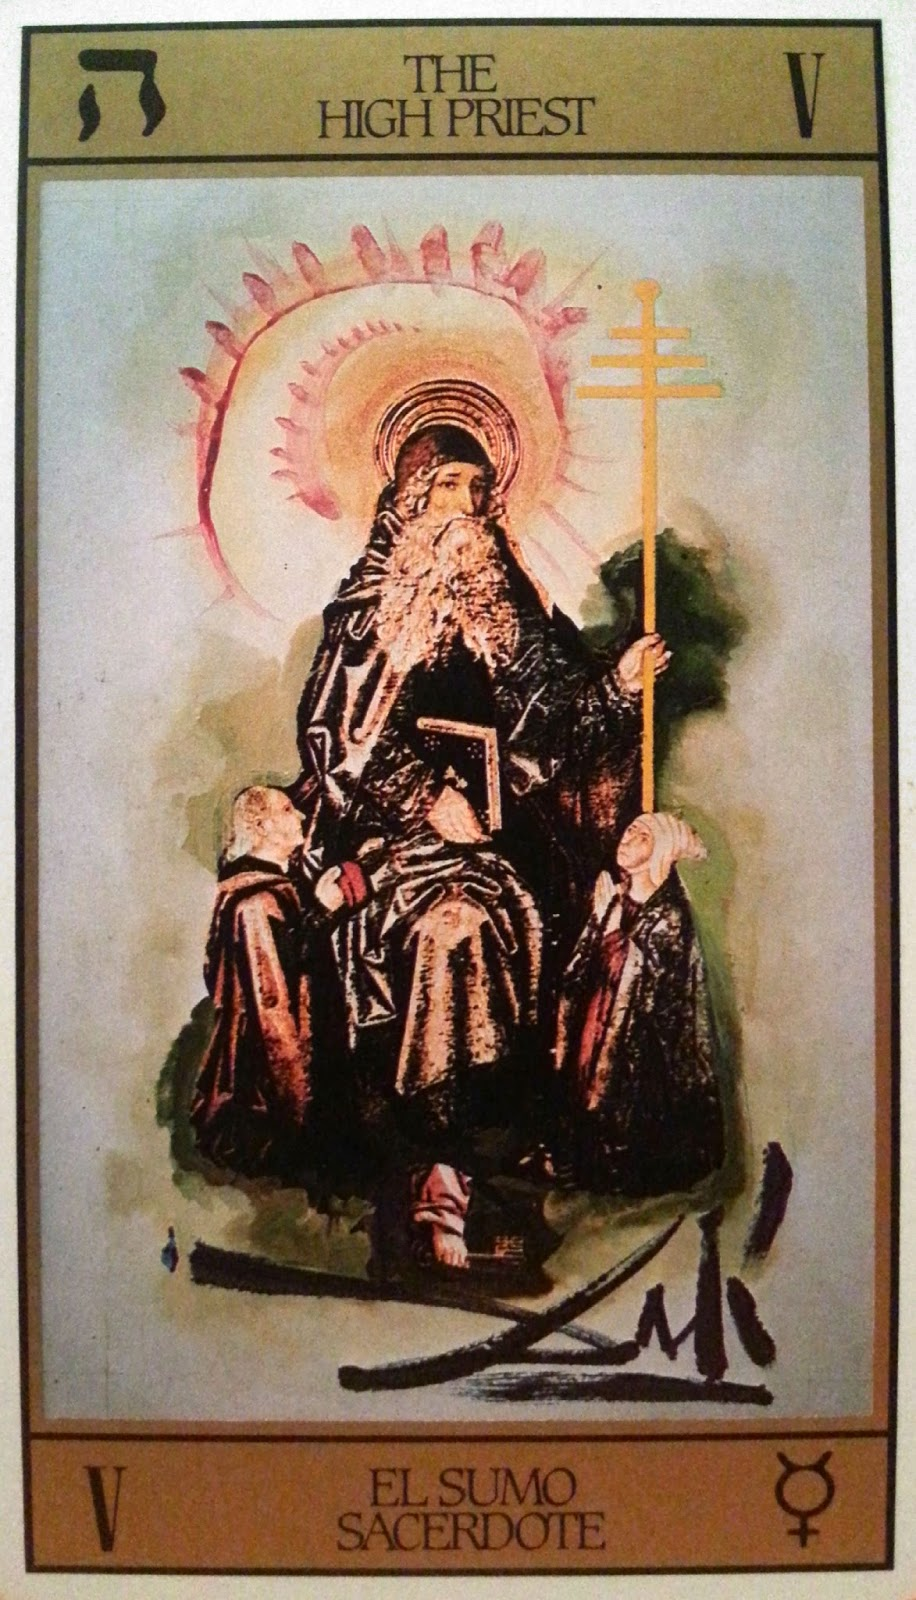 Sumo Sacerdote- Arcano V